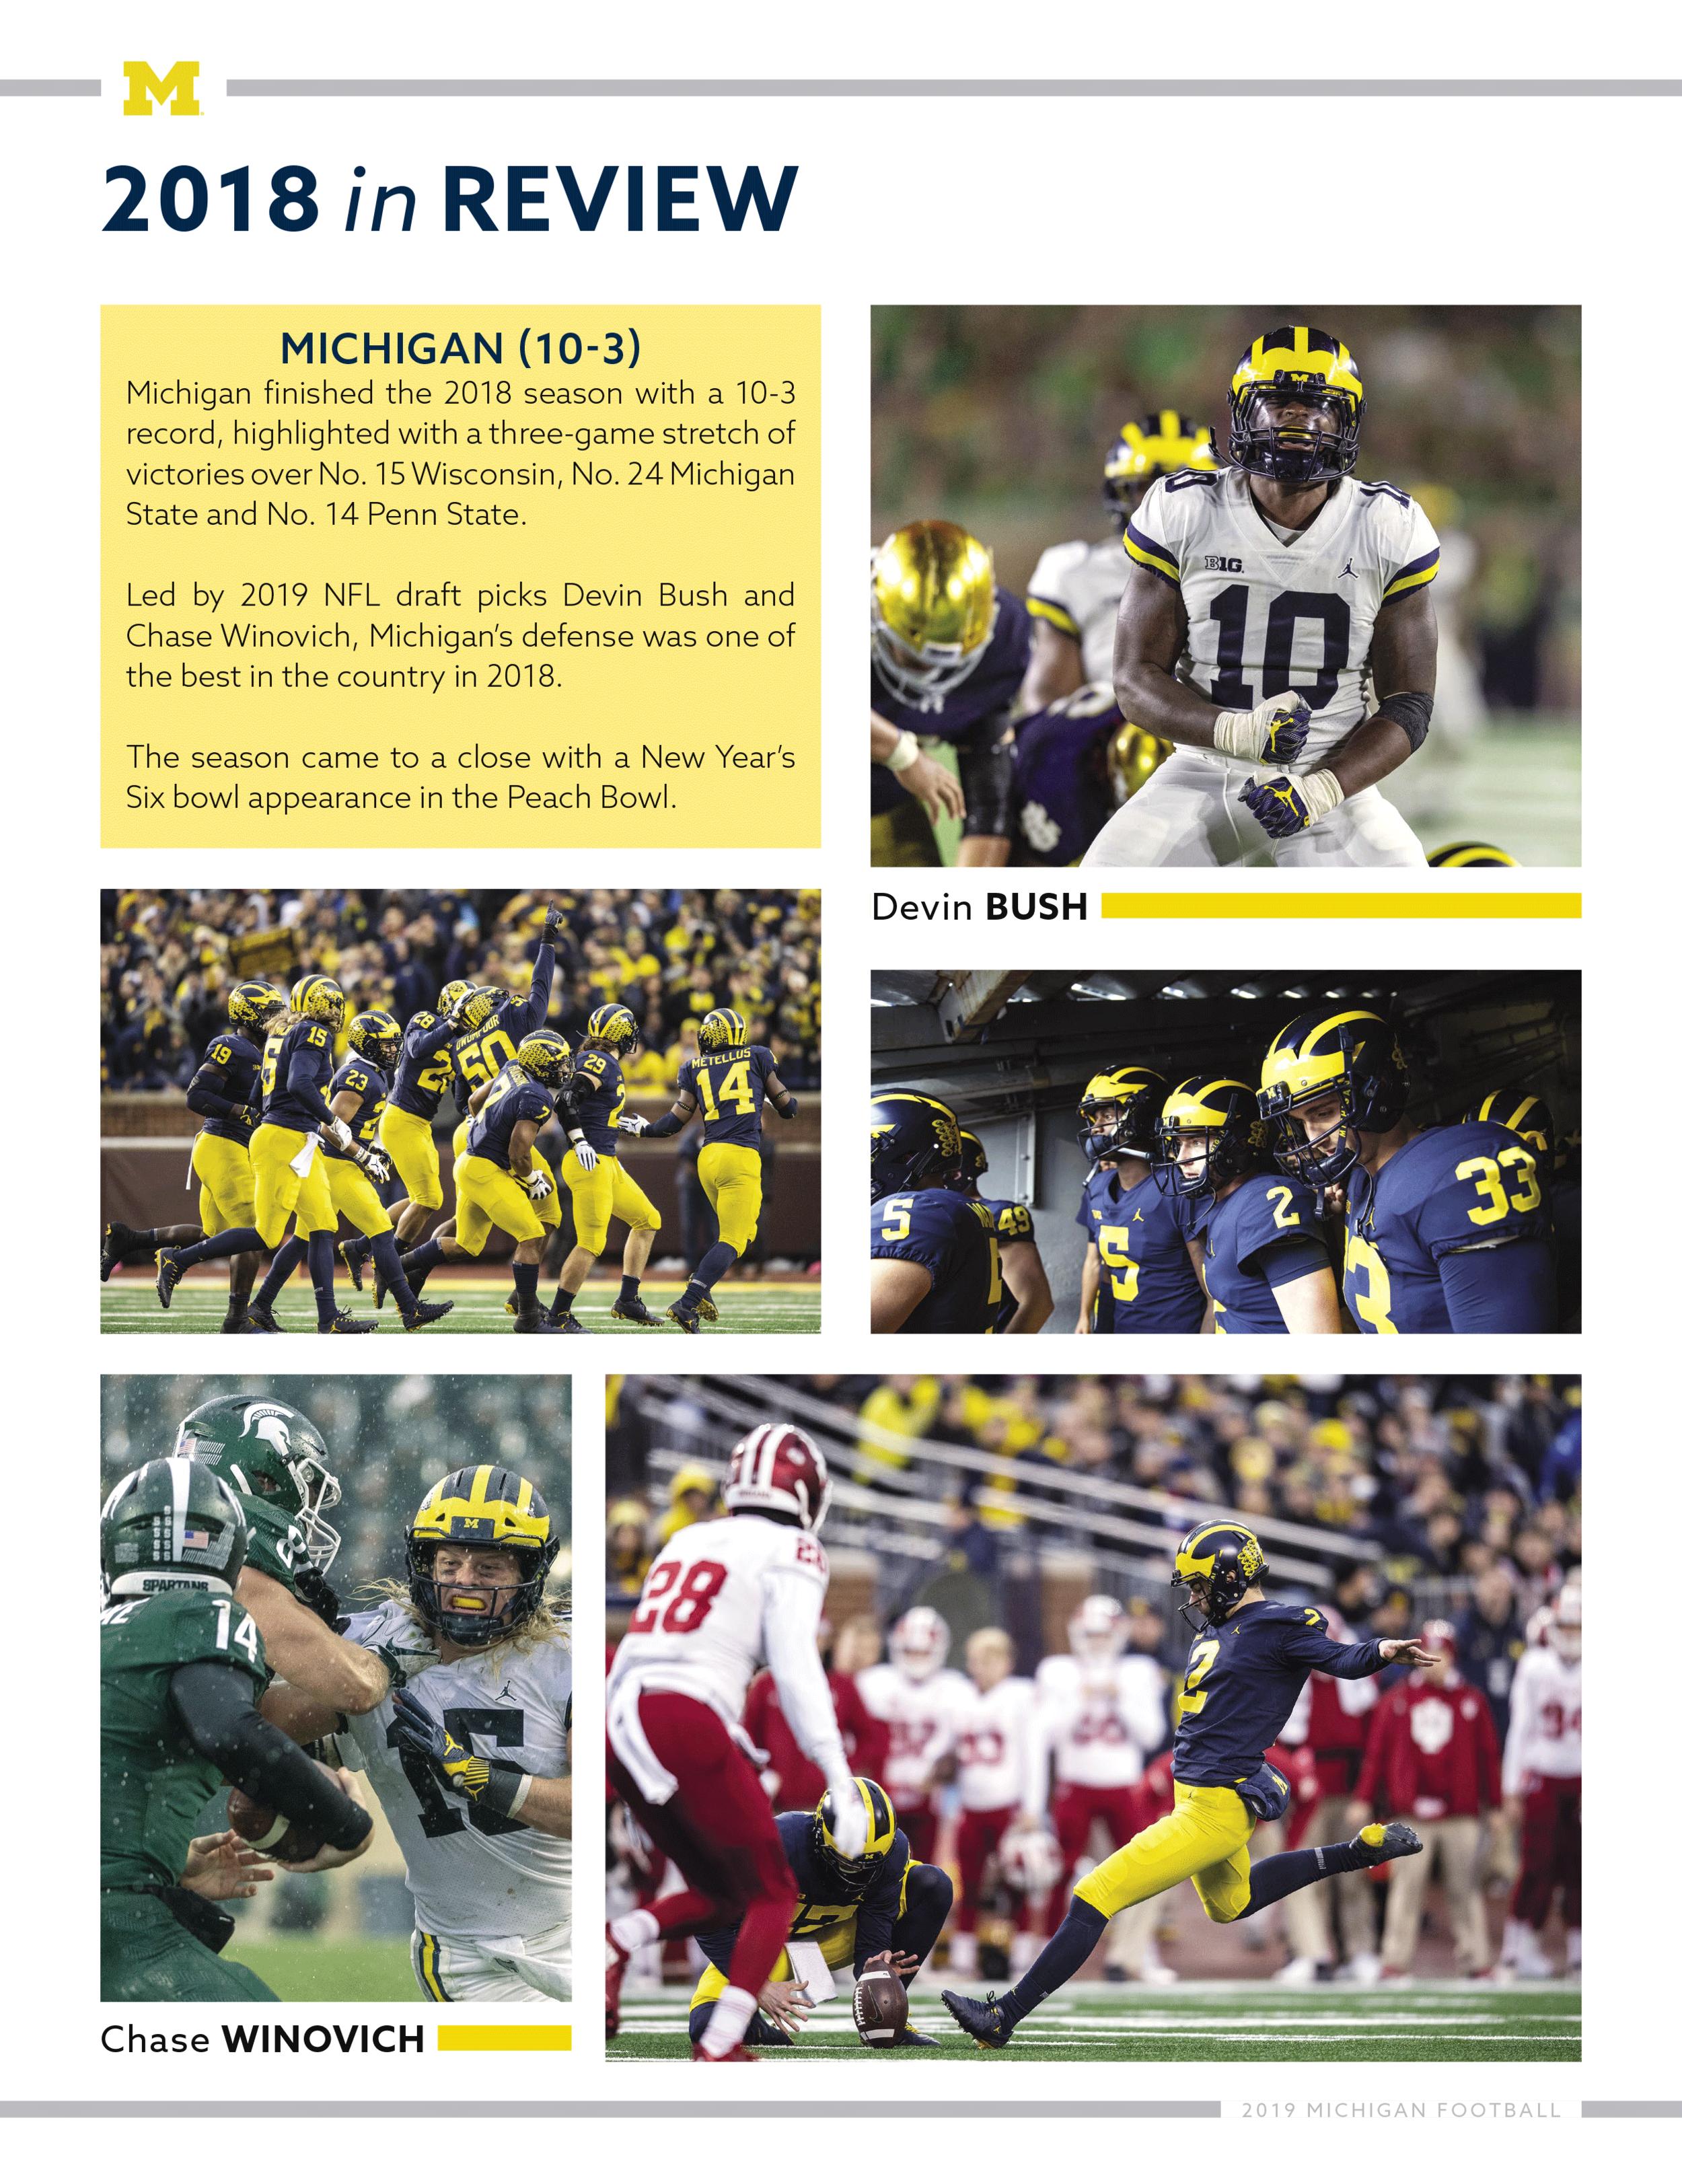 Michigan-Digital-FB19-Week-1-MTSU-5.png